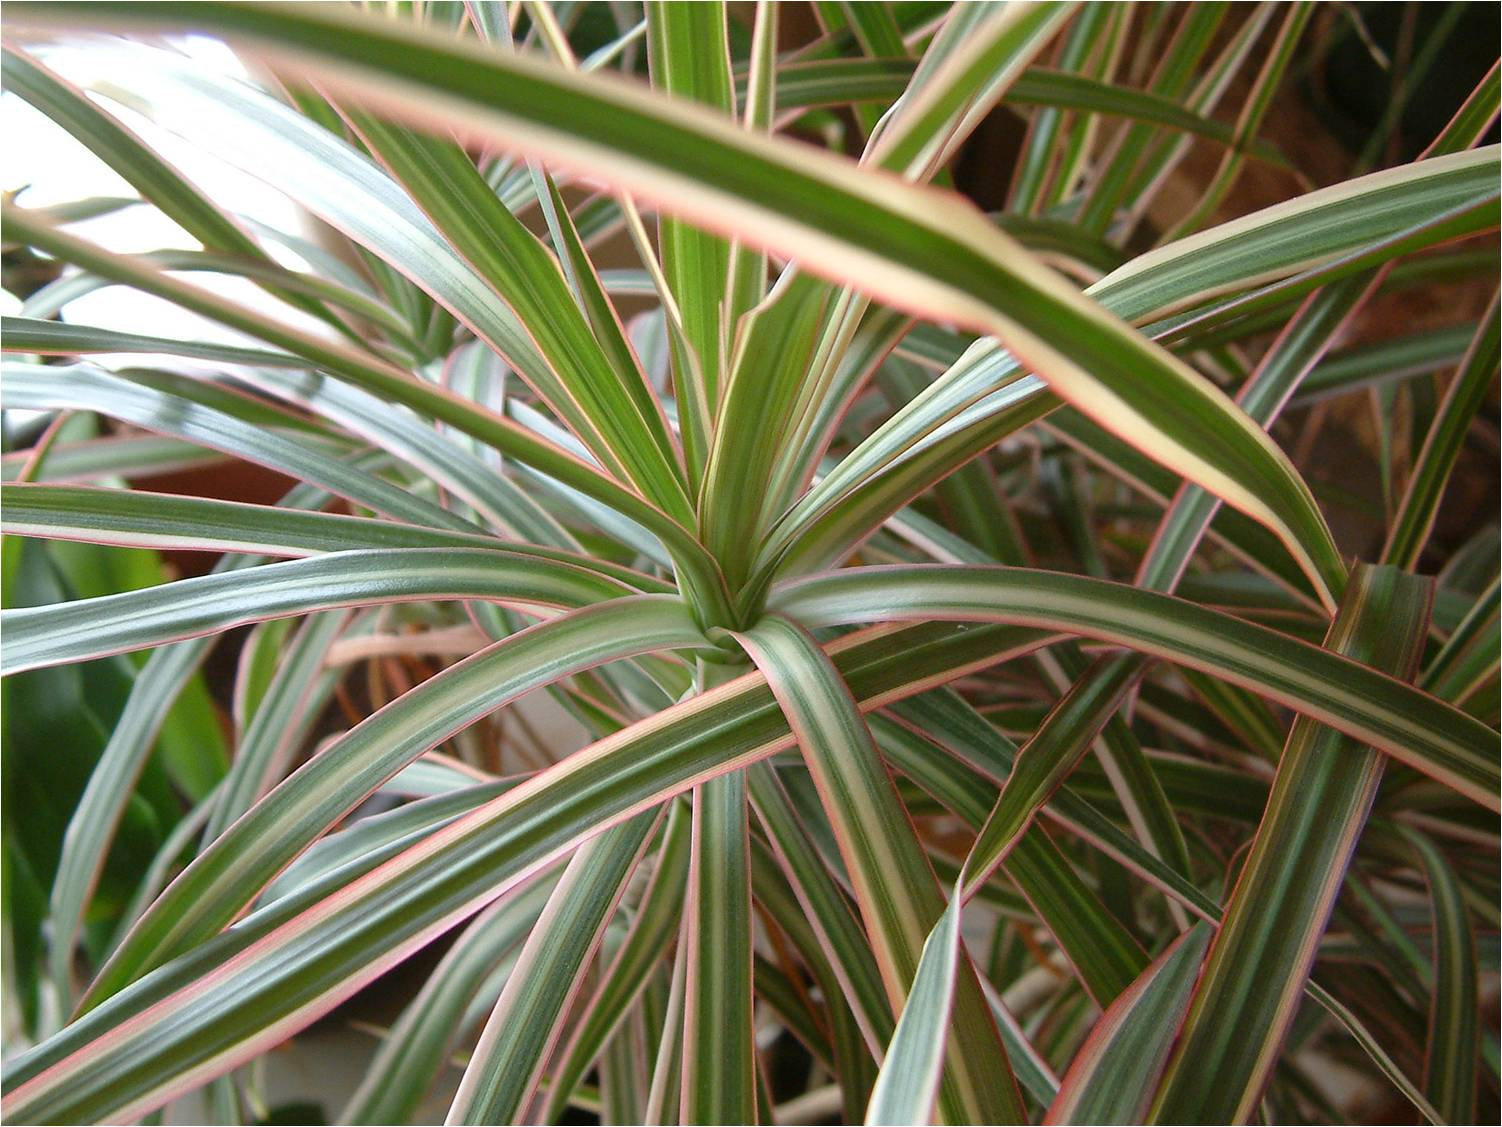 Dracaena marginata 'Tricolor' ou dracena arco-íris